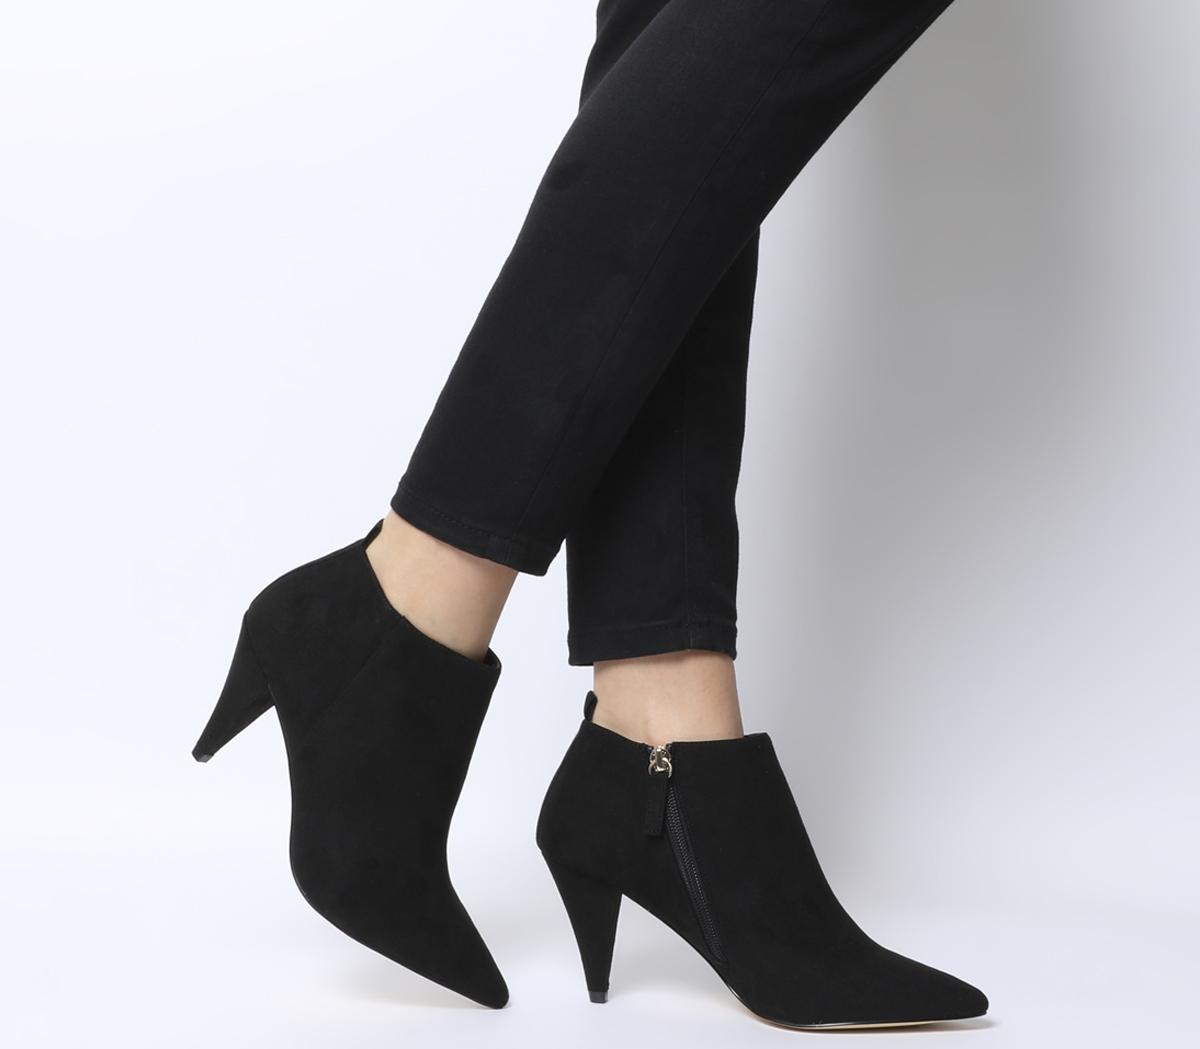 Office Mary Cone Heel Shoe Boots Black - Mid Heels